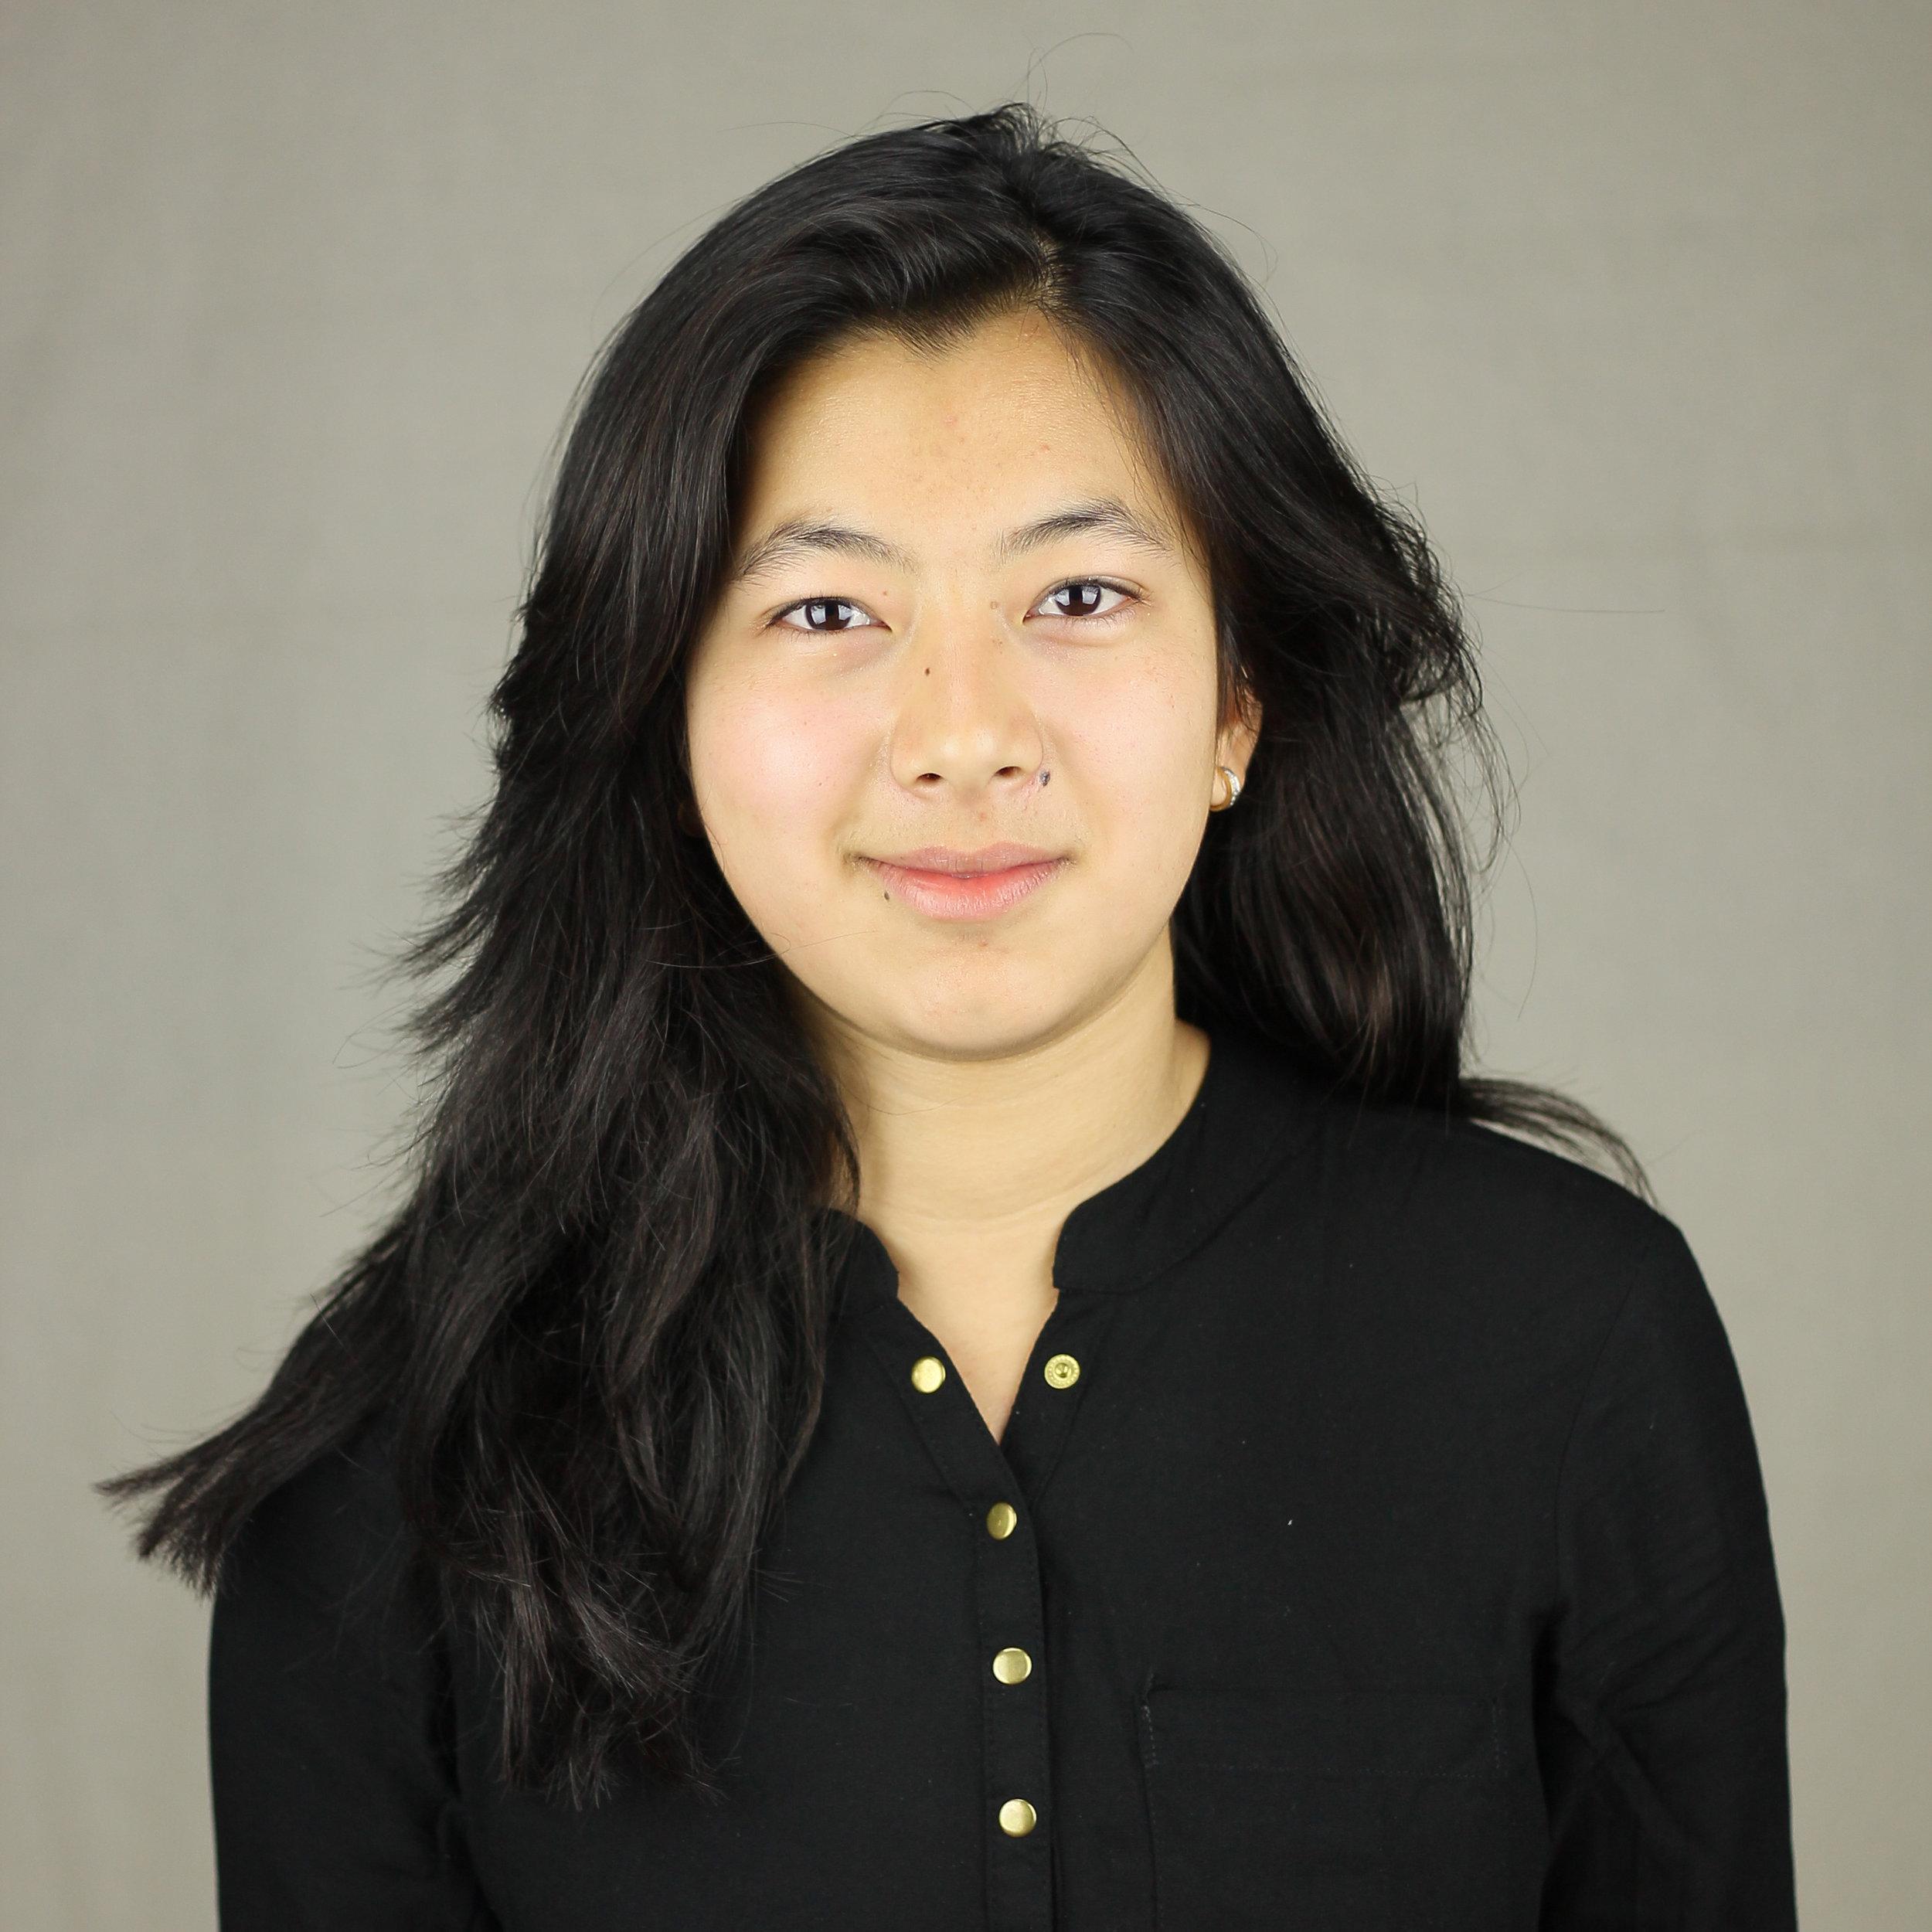 Eriko Shrestha Portrait (2015_02_05 13_57_35 UTC).JPG